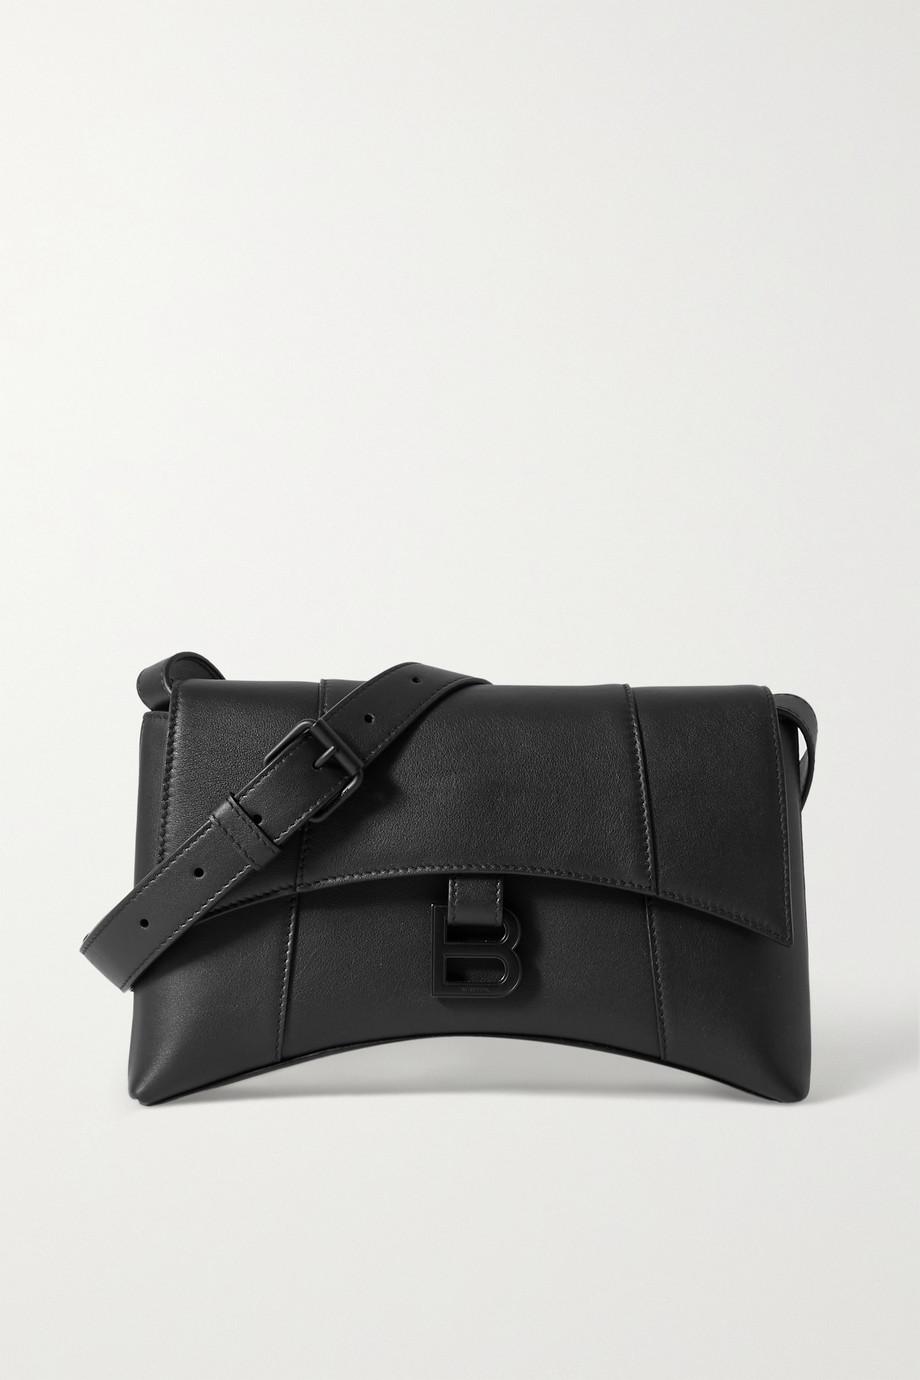 Balenciaga Hourglass XS leather shoulder bag